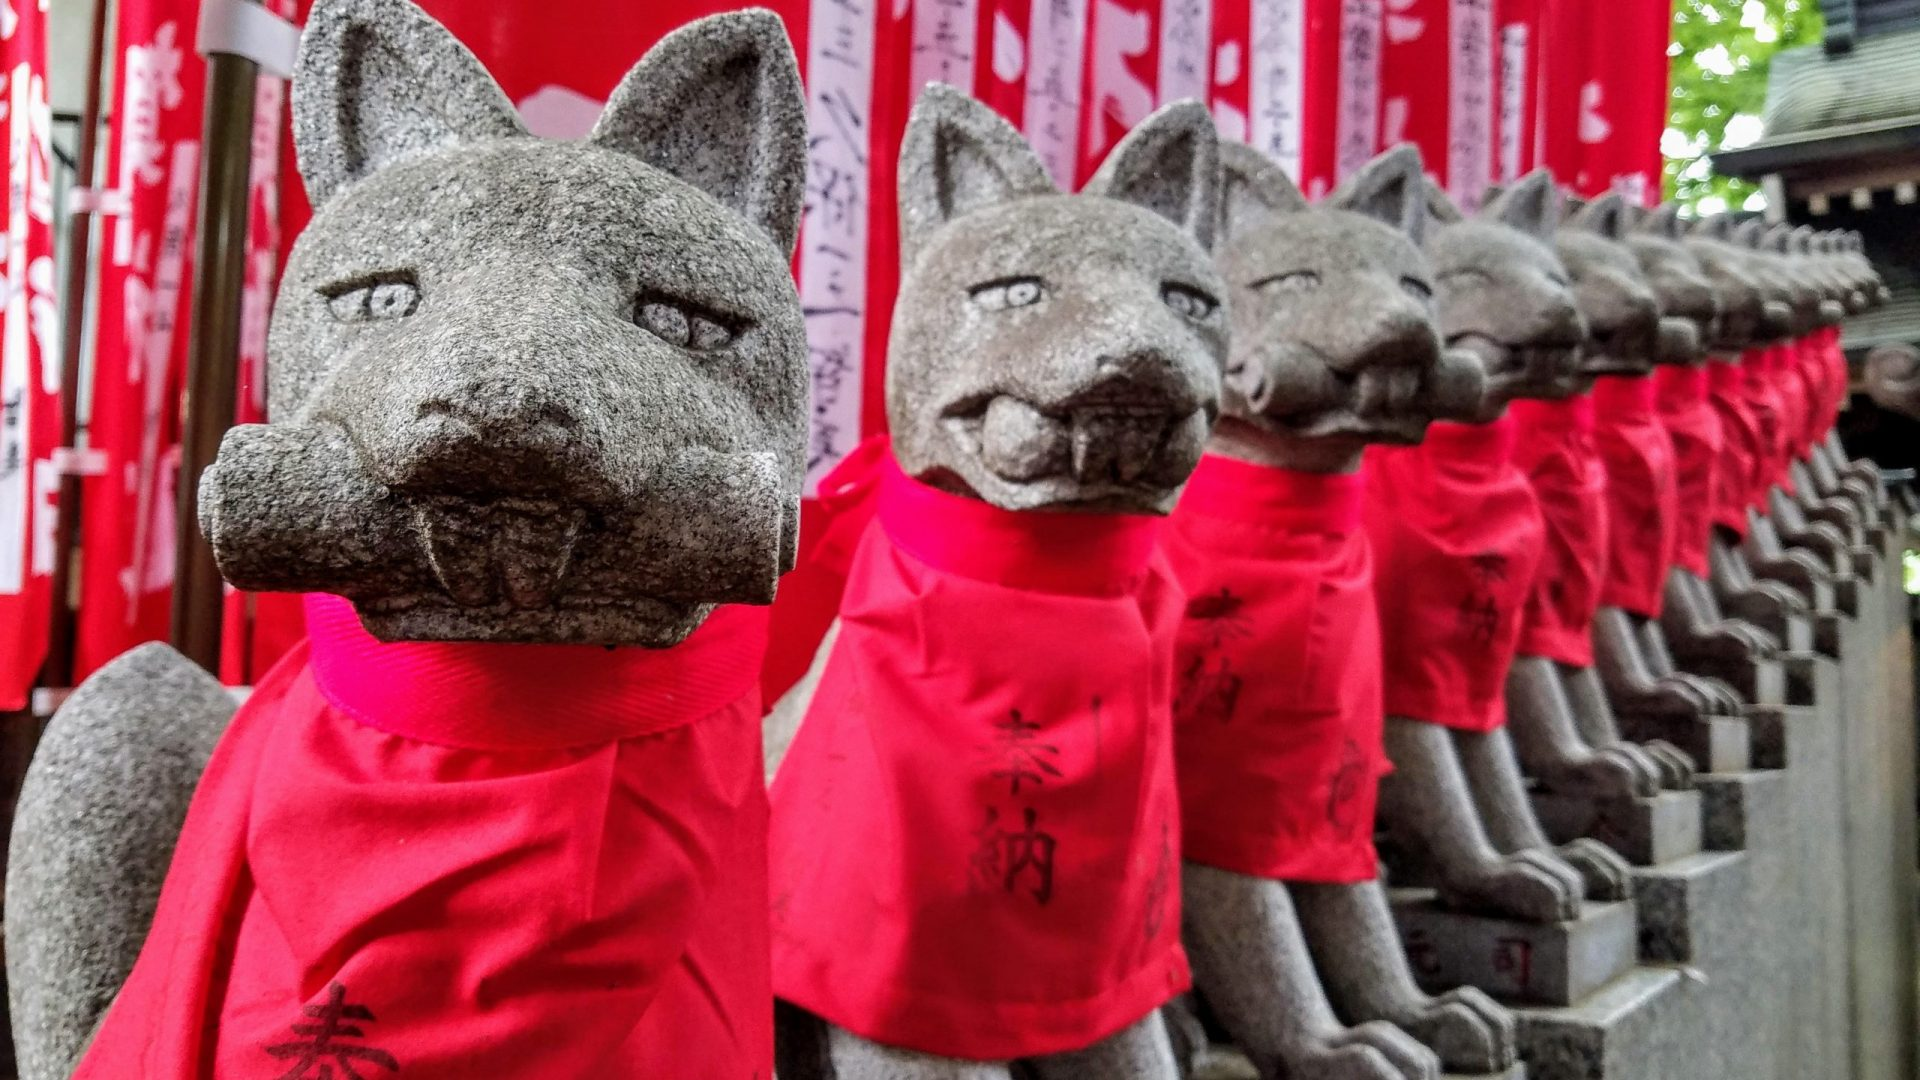 Toyokawa Inari Tokyo Betsuin: A Journey Down the Fox Hole